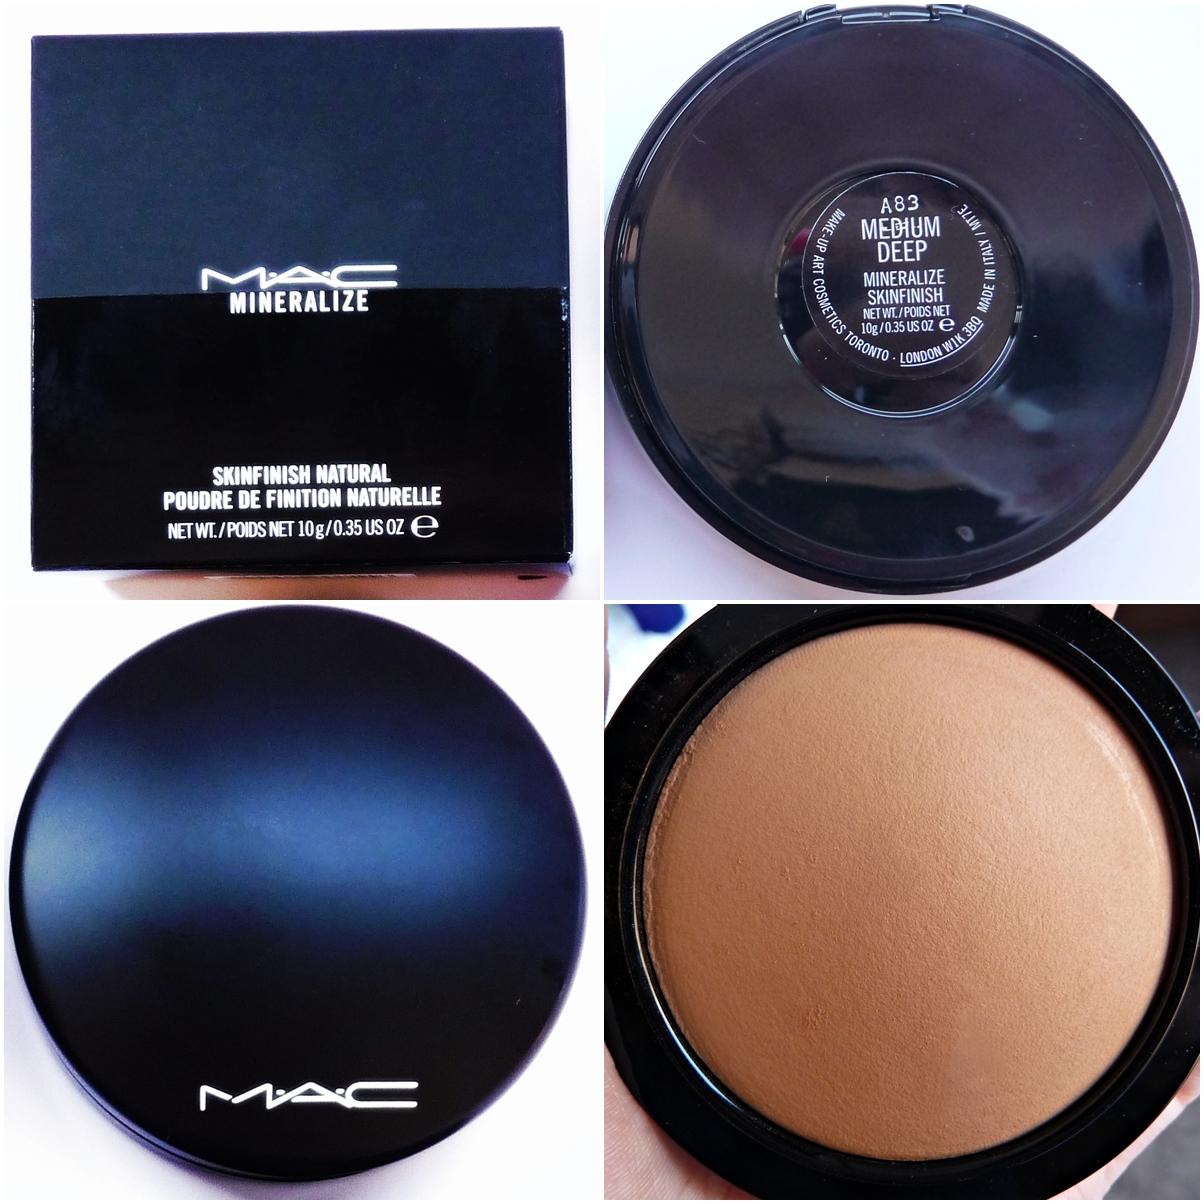 Polvos minerales de MAC (Mineralize Skinfinish Natural, tono Medium Deep)